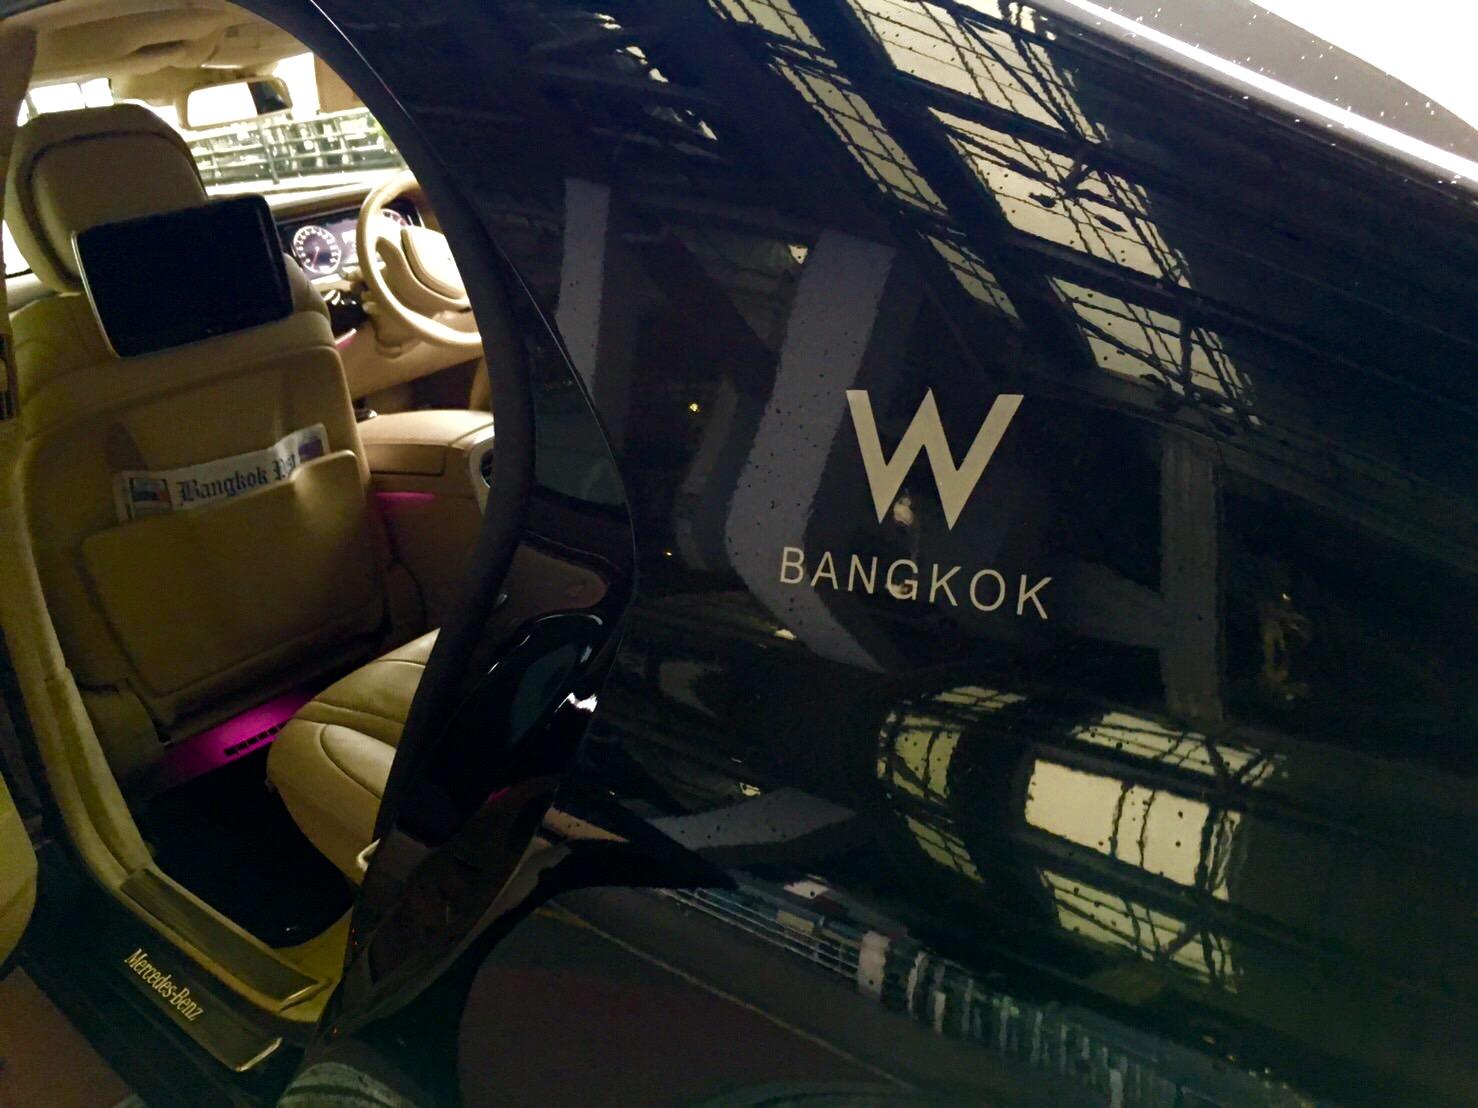 Wホテル-バンコク-リムジン-空港送迎-1